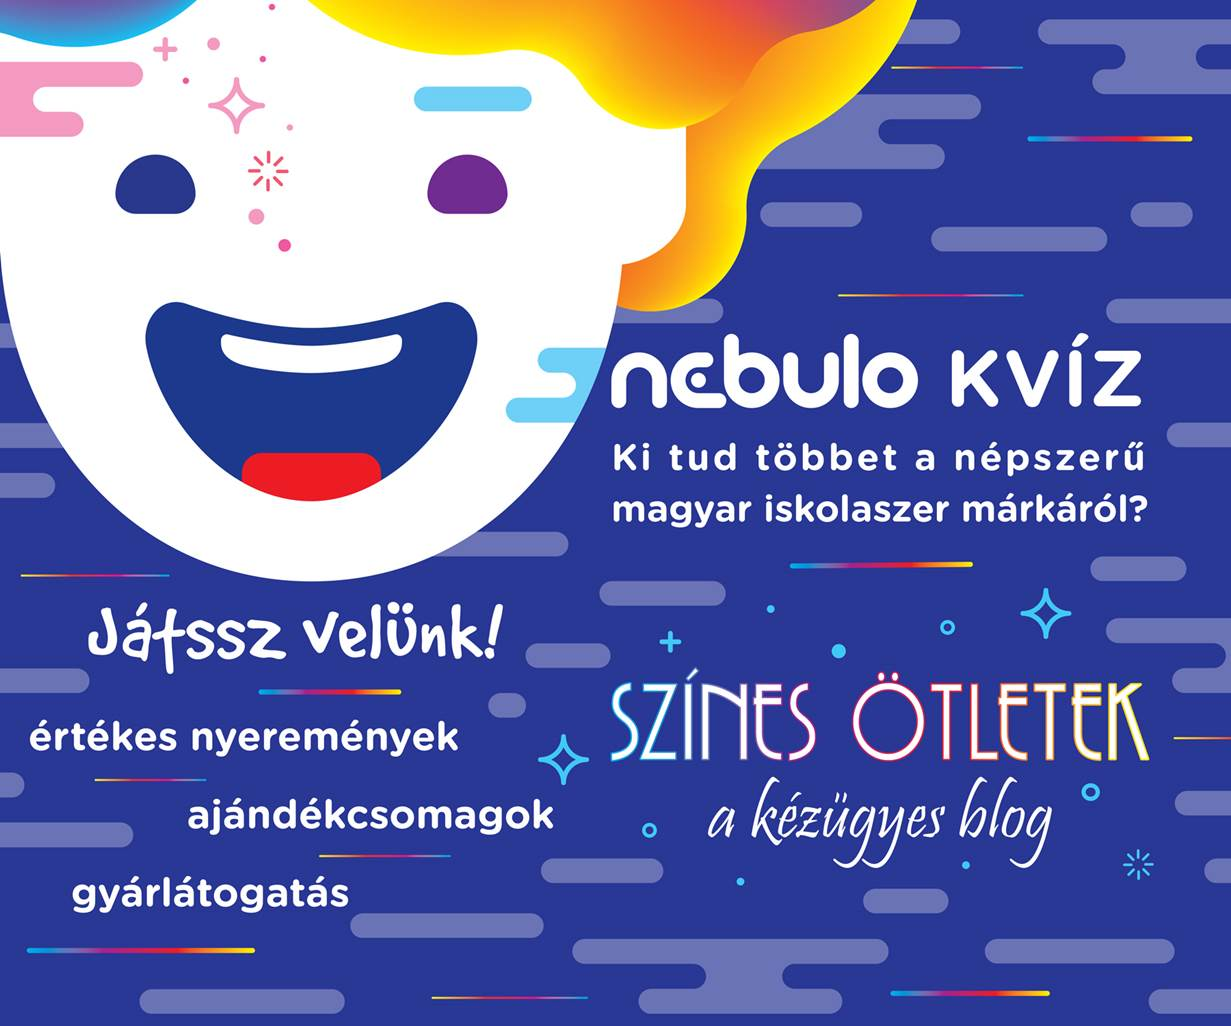 nebulo_banner.jpg